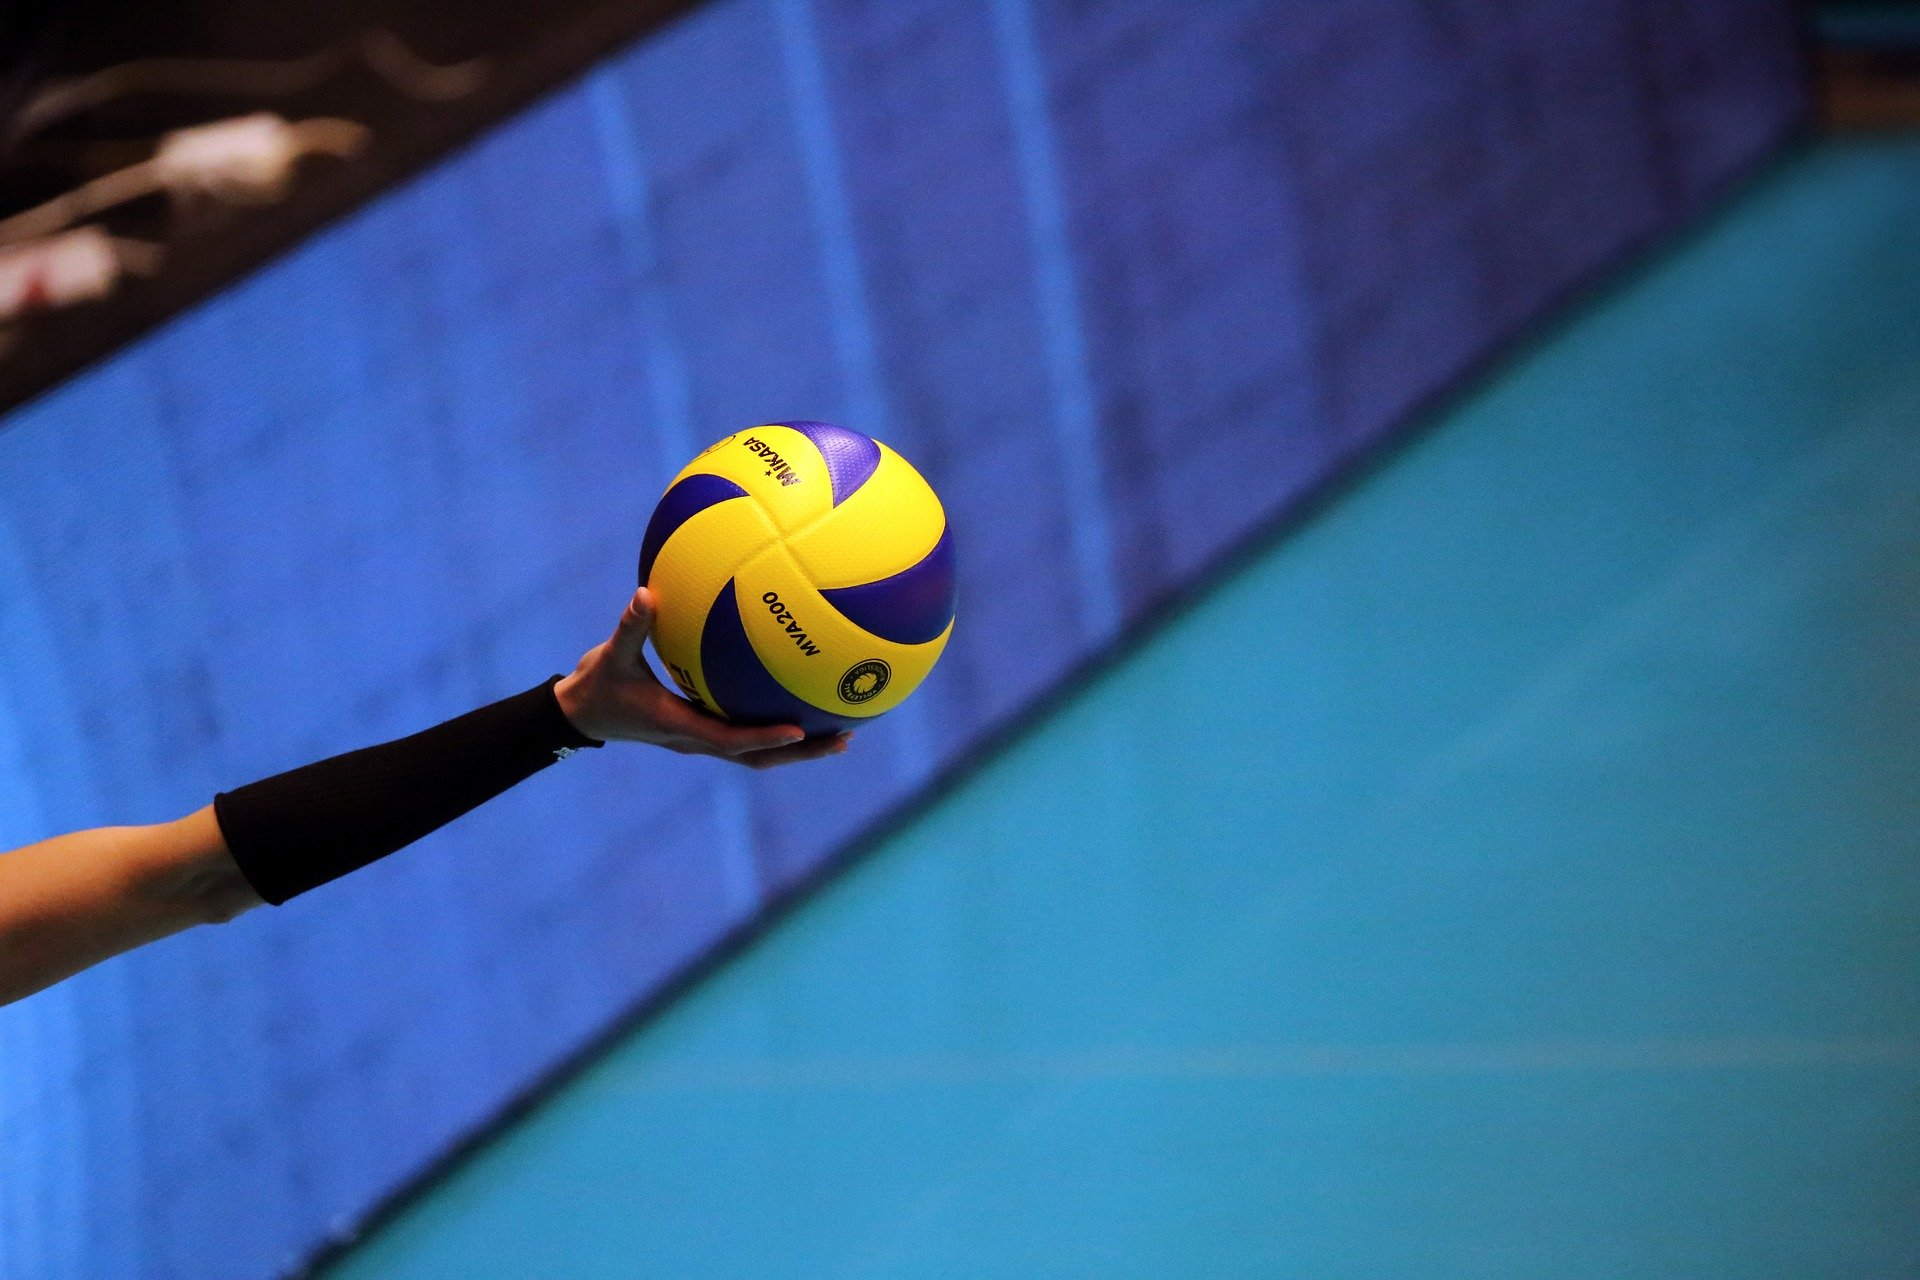 volleyball-15DE44583-B5FF-6BBF-9190-2548C0C414B9.jpg